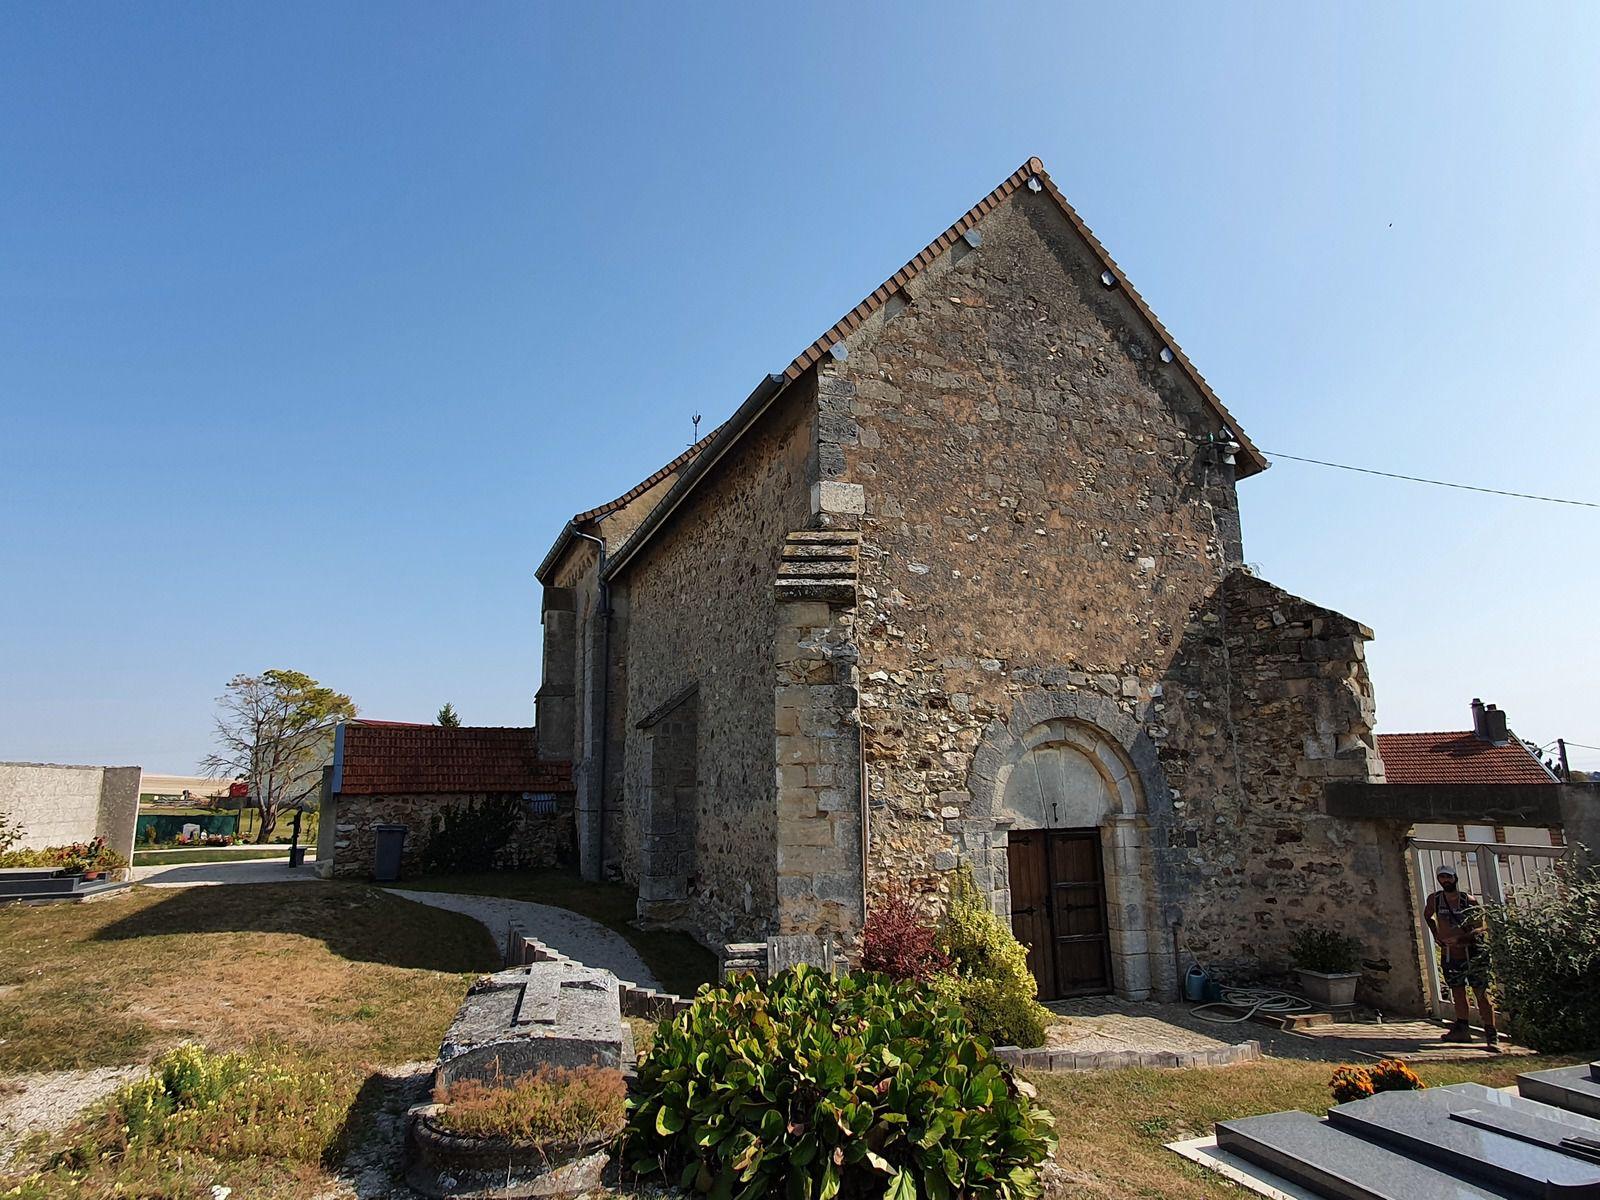 18 septembre 2020 - La Via Francigena de Verzy à Condé-sur-Marne